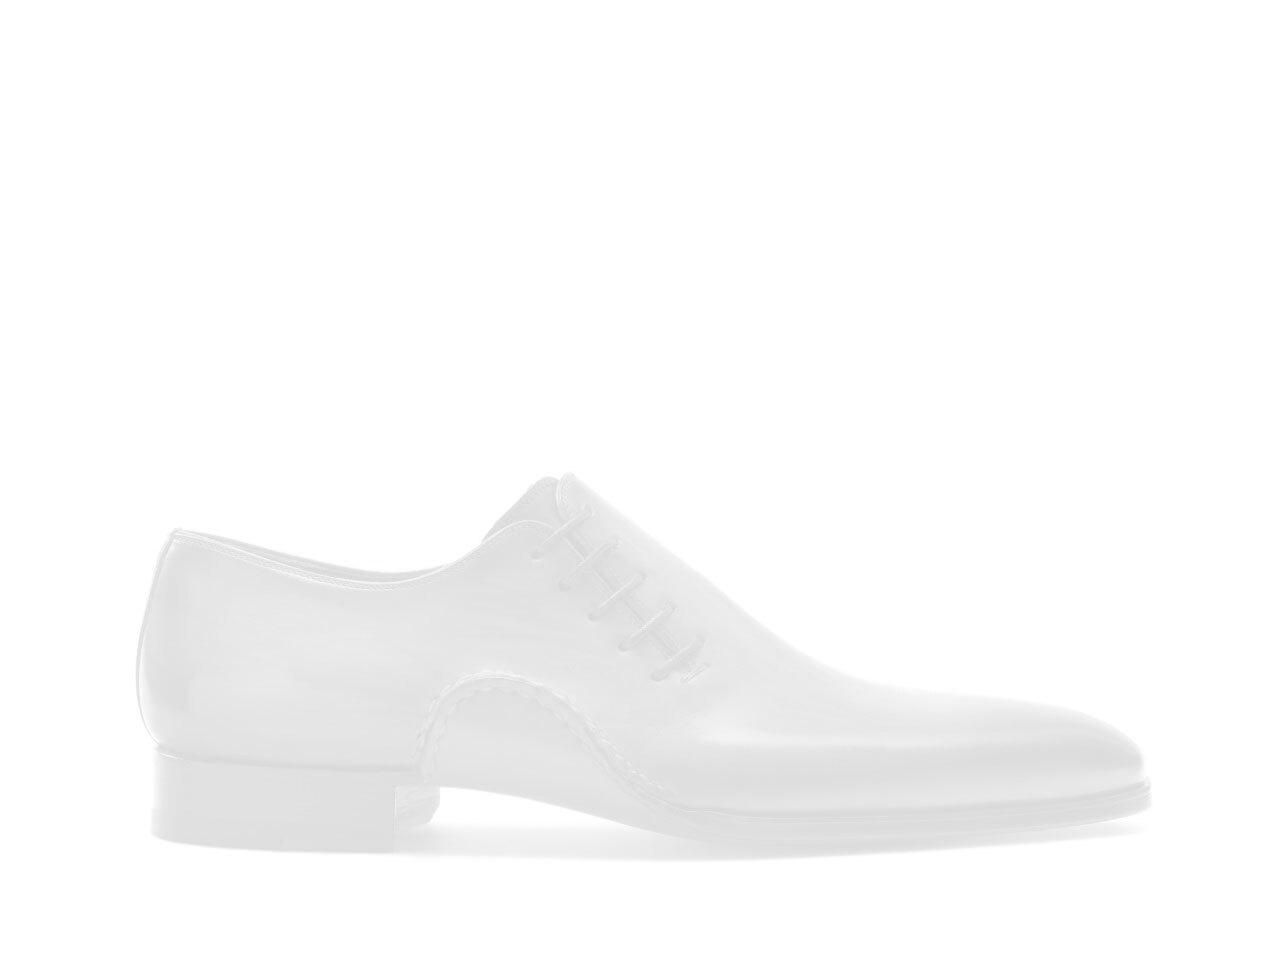 Side view of the Magnanni Zalamea Cuero Men's Oxford Shoes